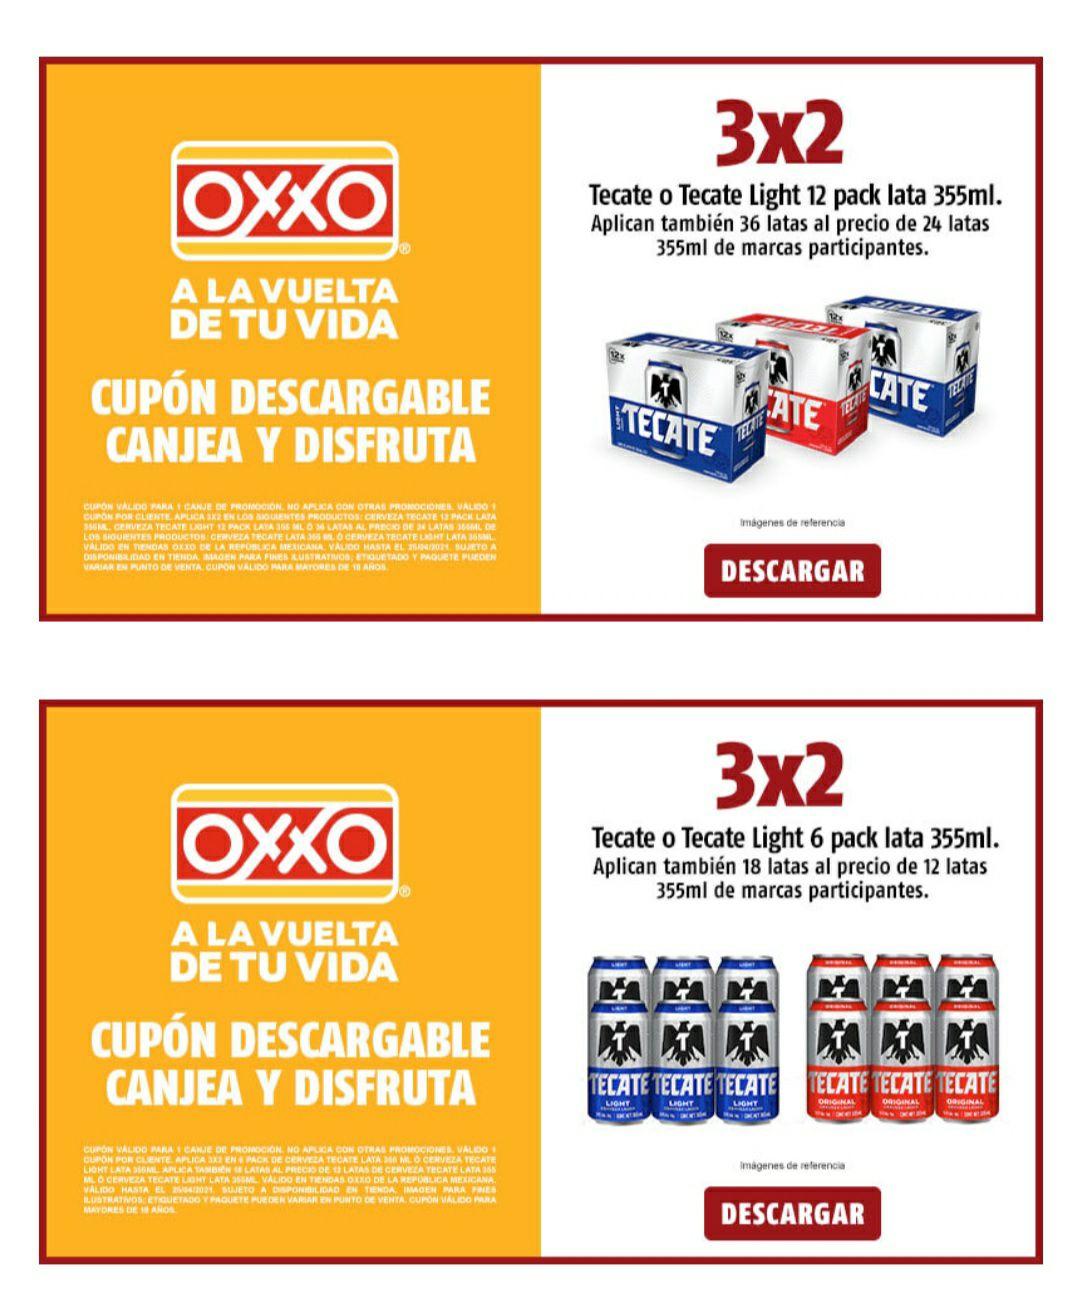 OXXO: 3X2 EN 12PACK, SIXPACK